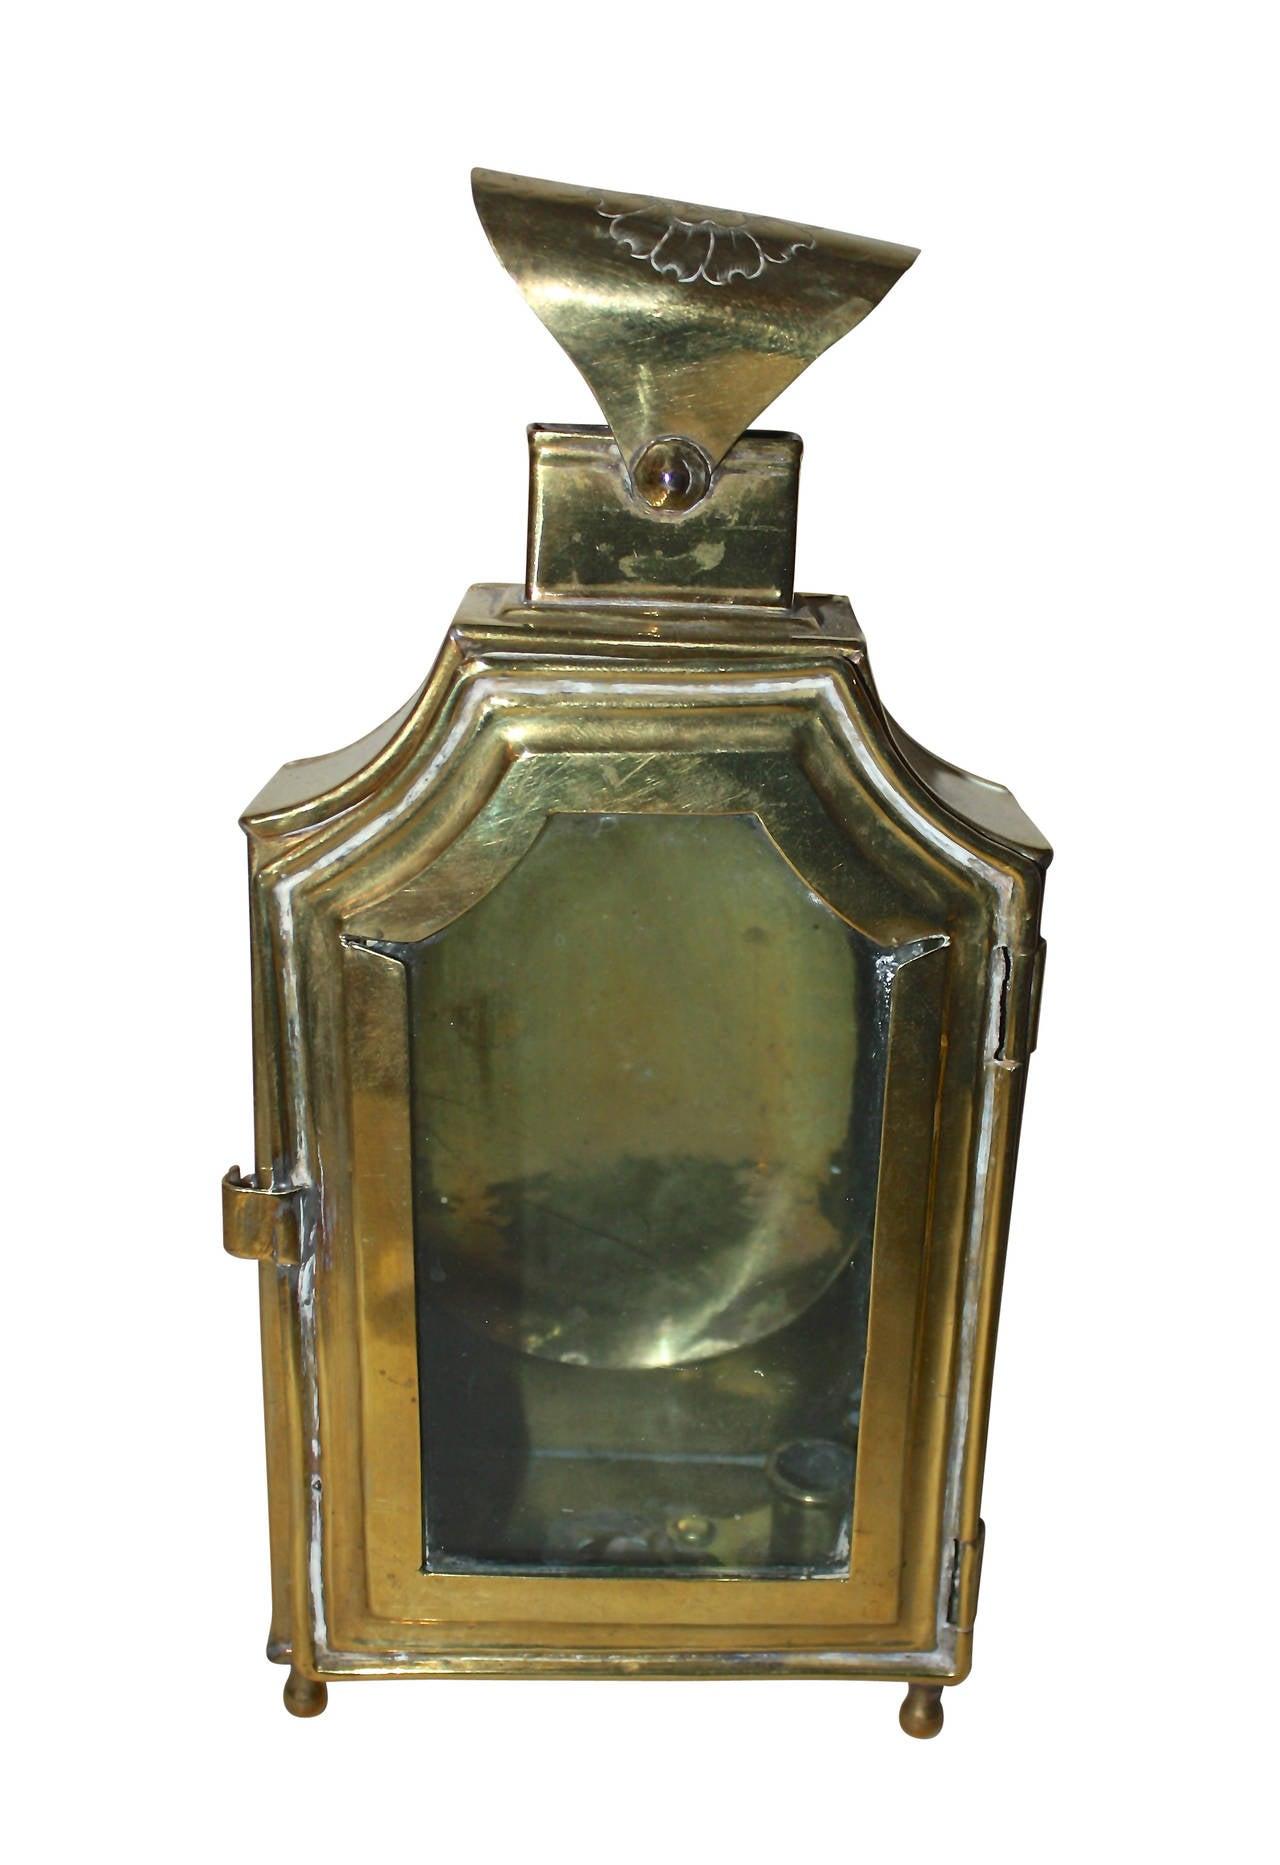 European 18th Century Rococo Brass Lantern For Sale